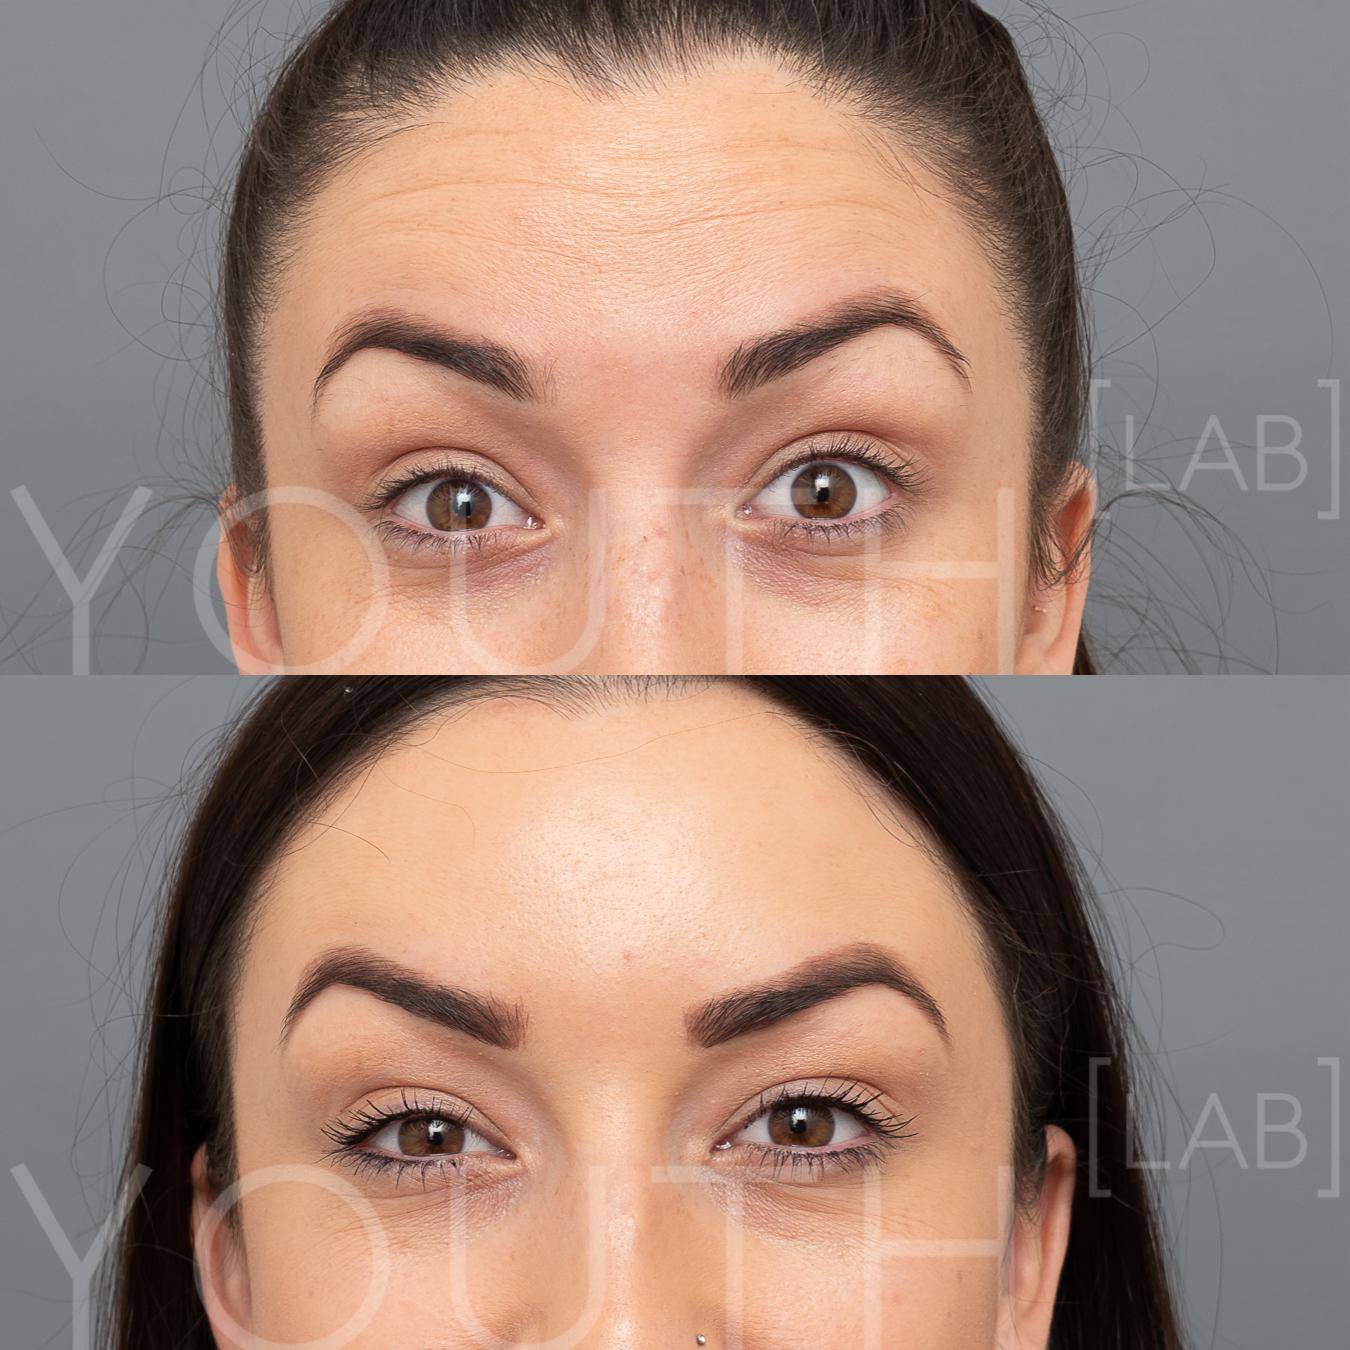 TASH K - anti-wrinkle Forehead B&A.jpg